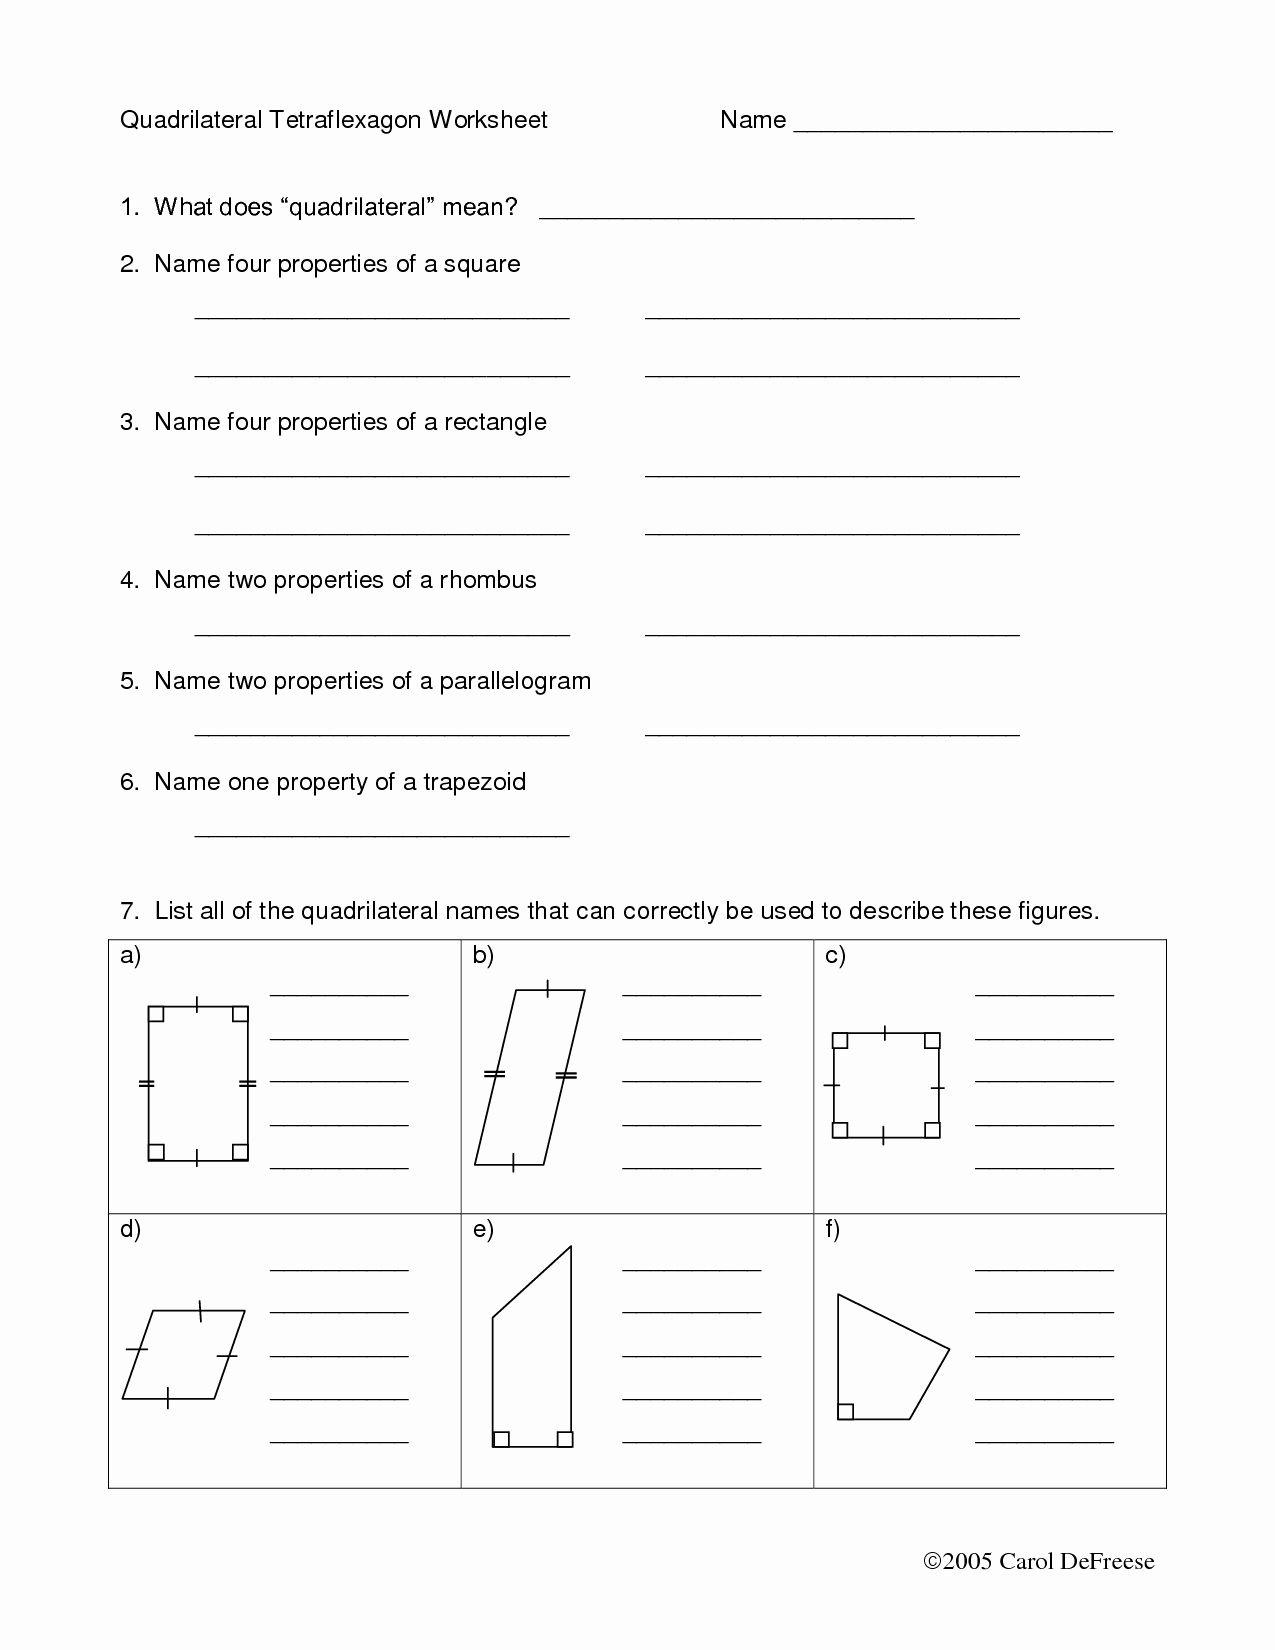 50 Properties Of Quadrilateral Worksheet In